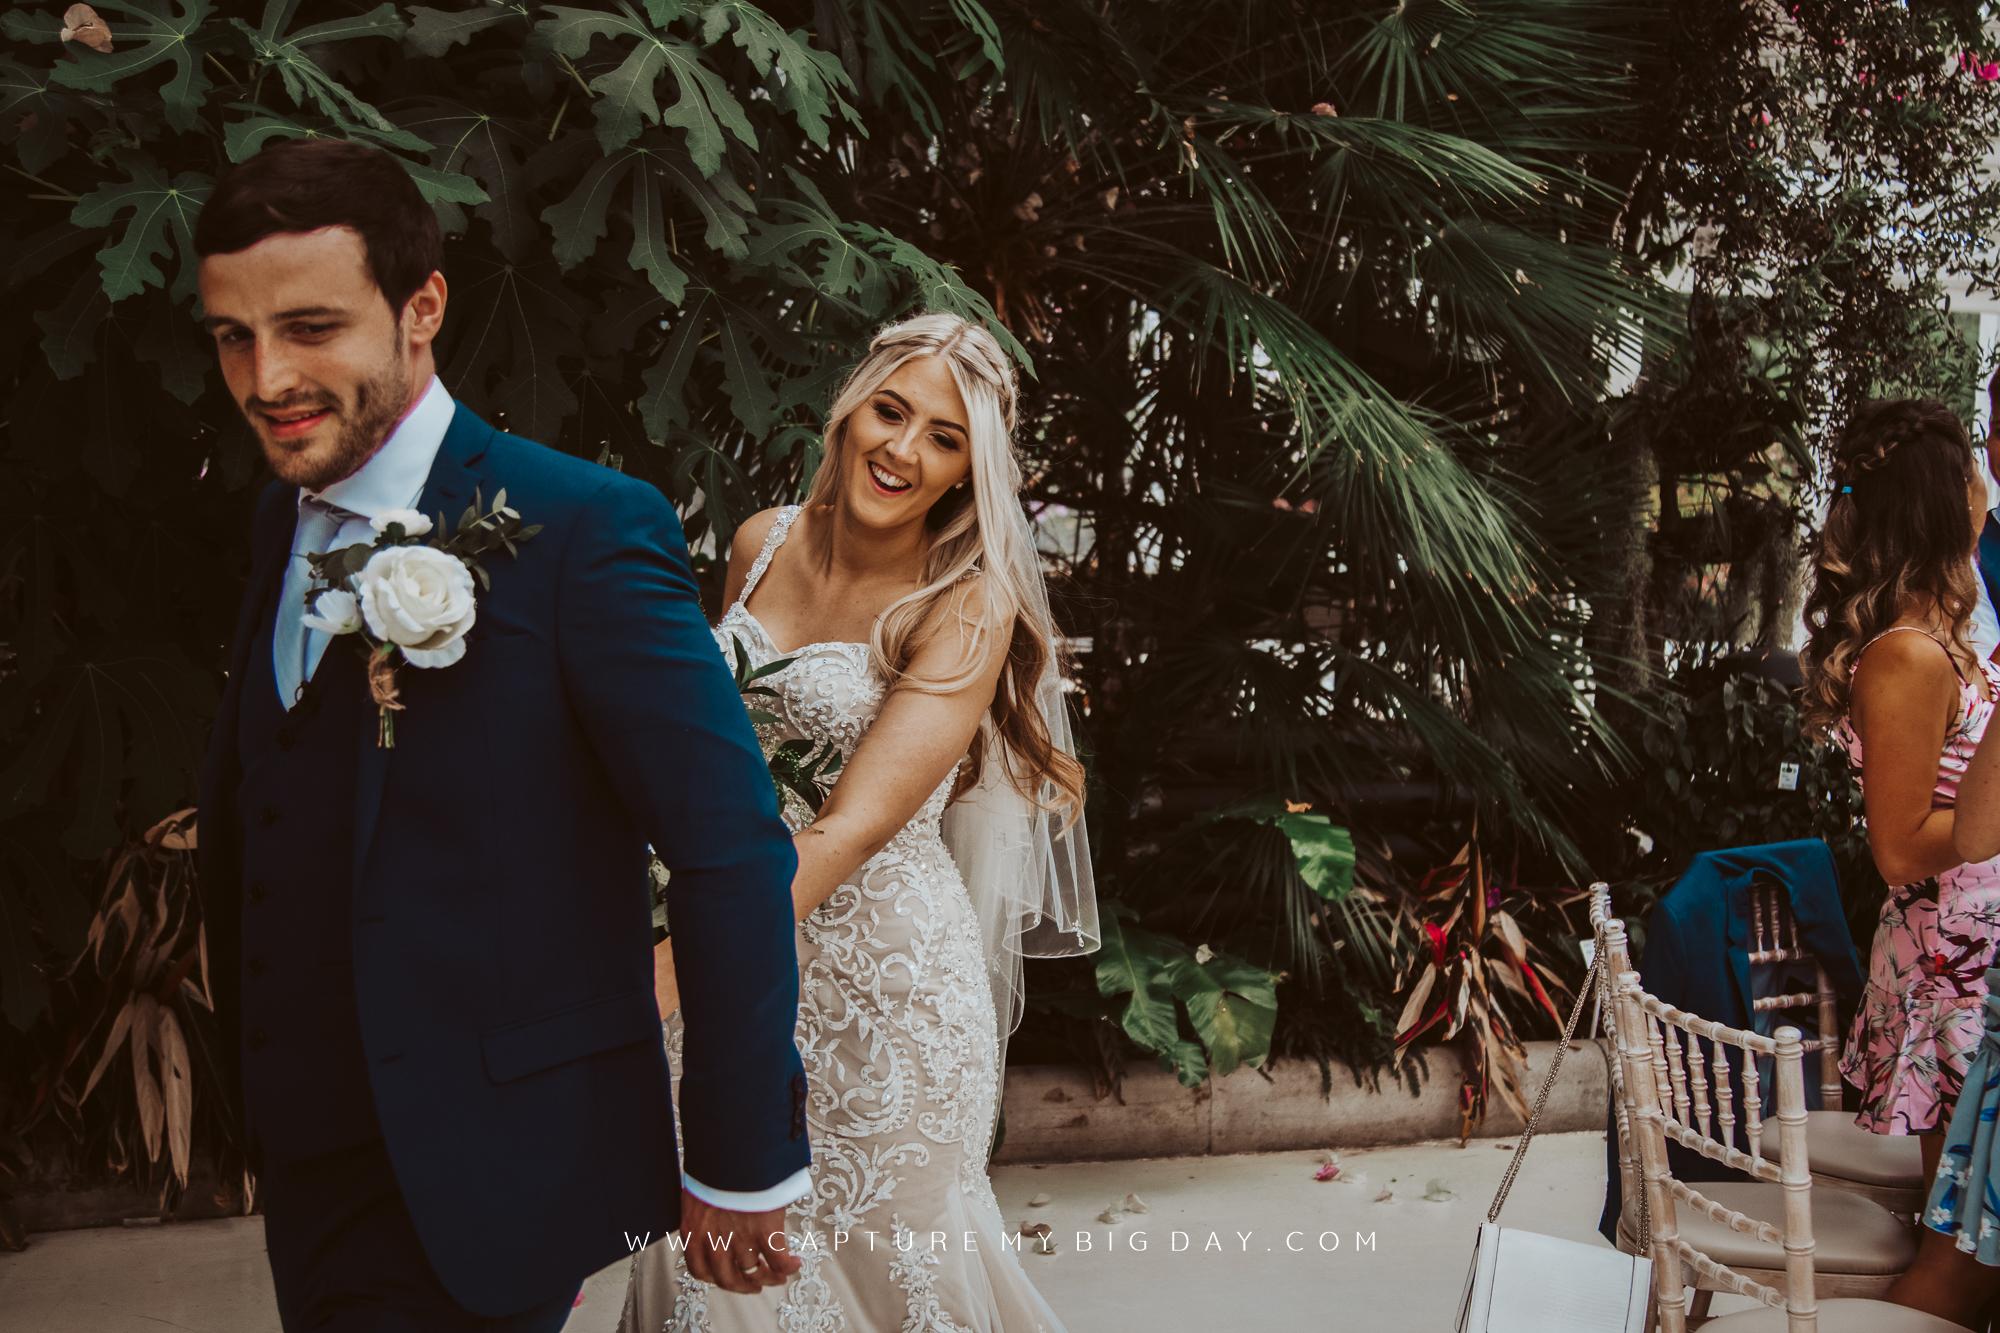 groom leading the bride into the wedding breakfast room